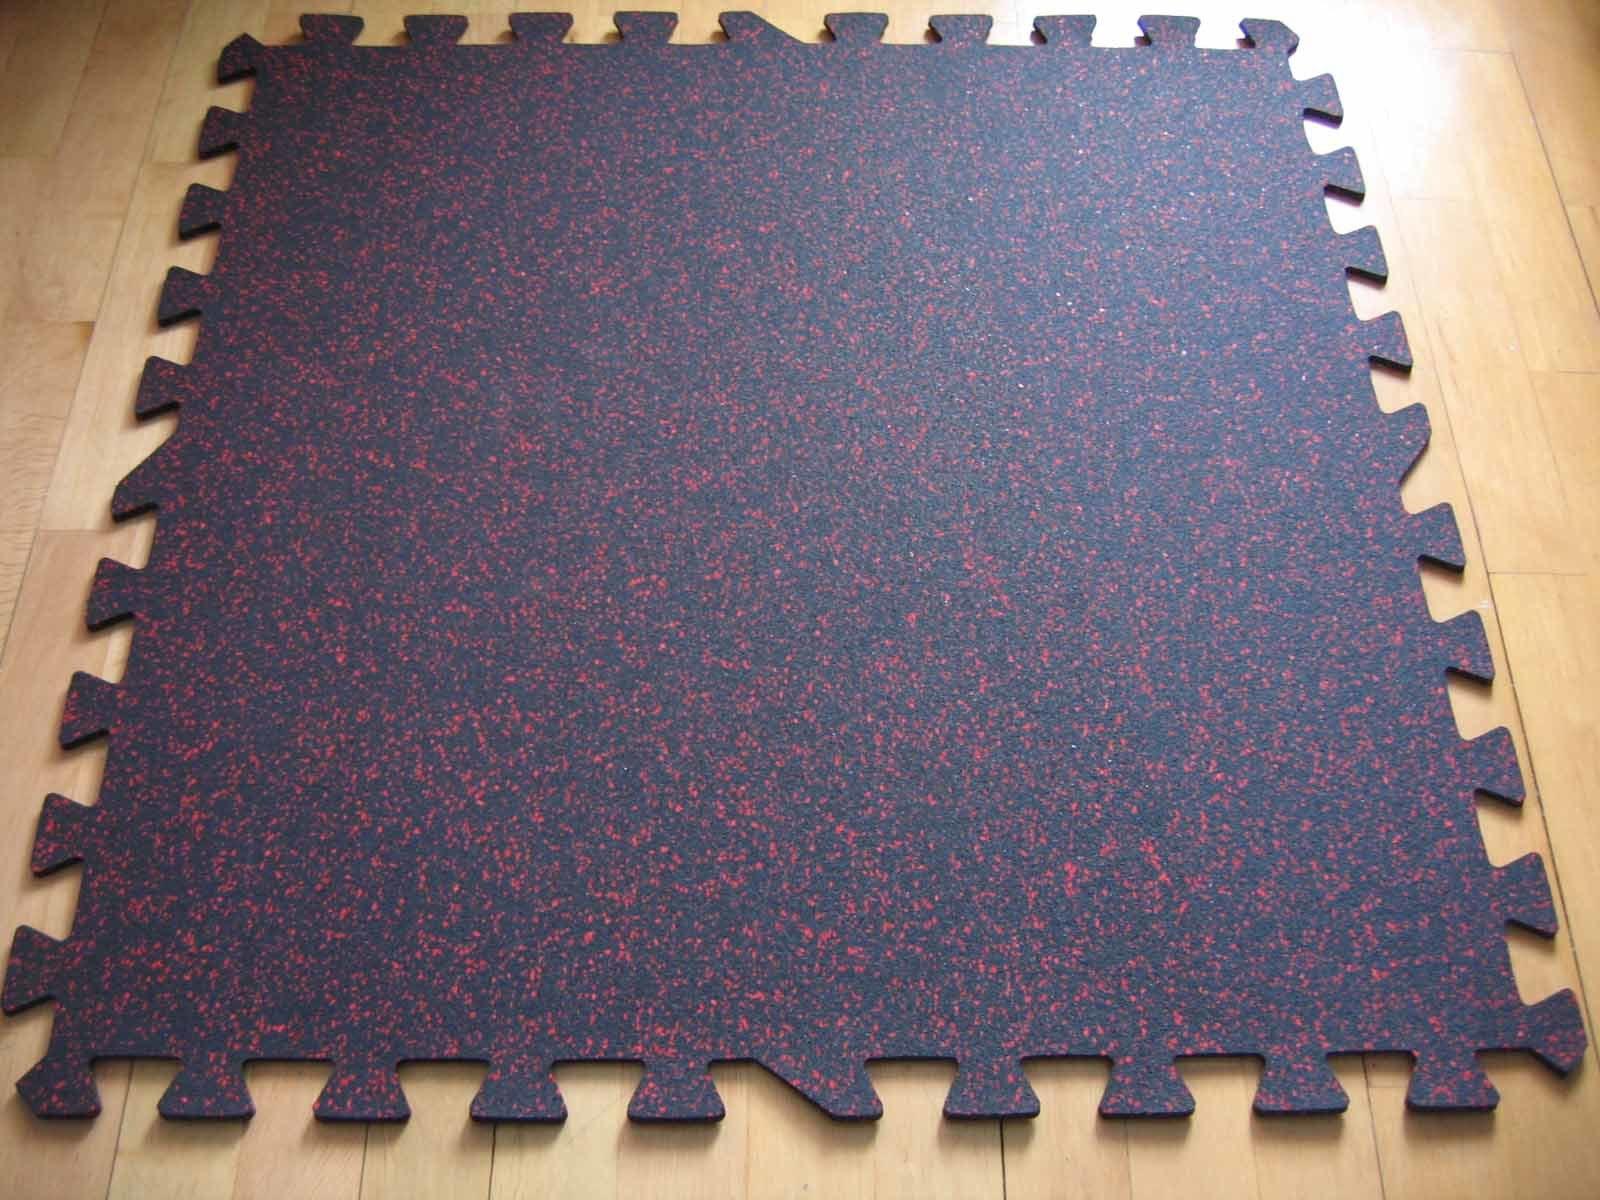 China Interlocking Rubber Gym Tile 1m X 1m Photos